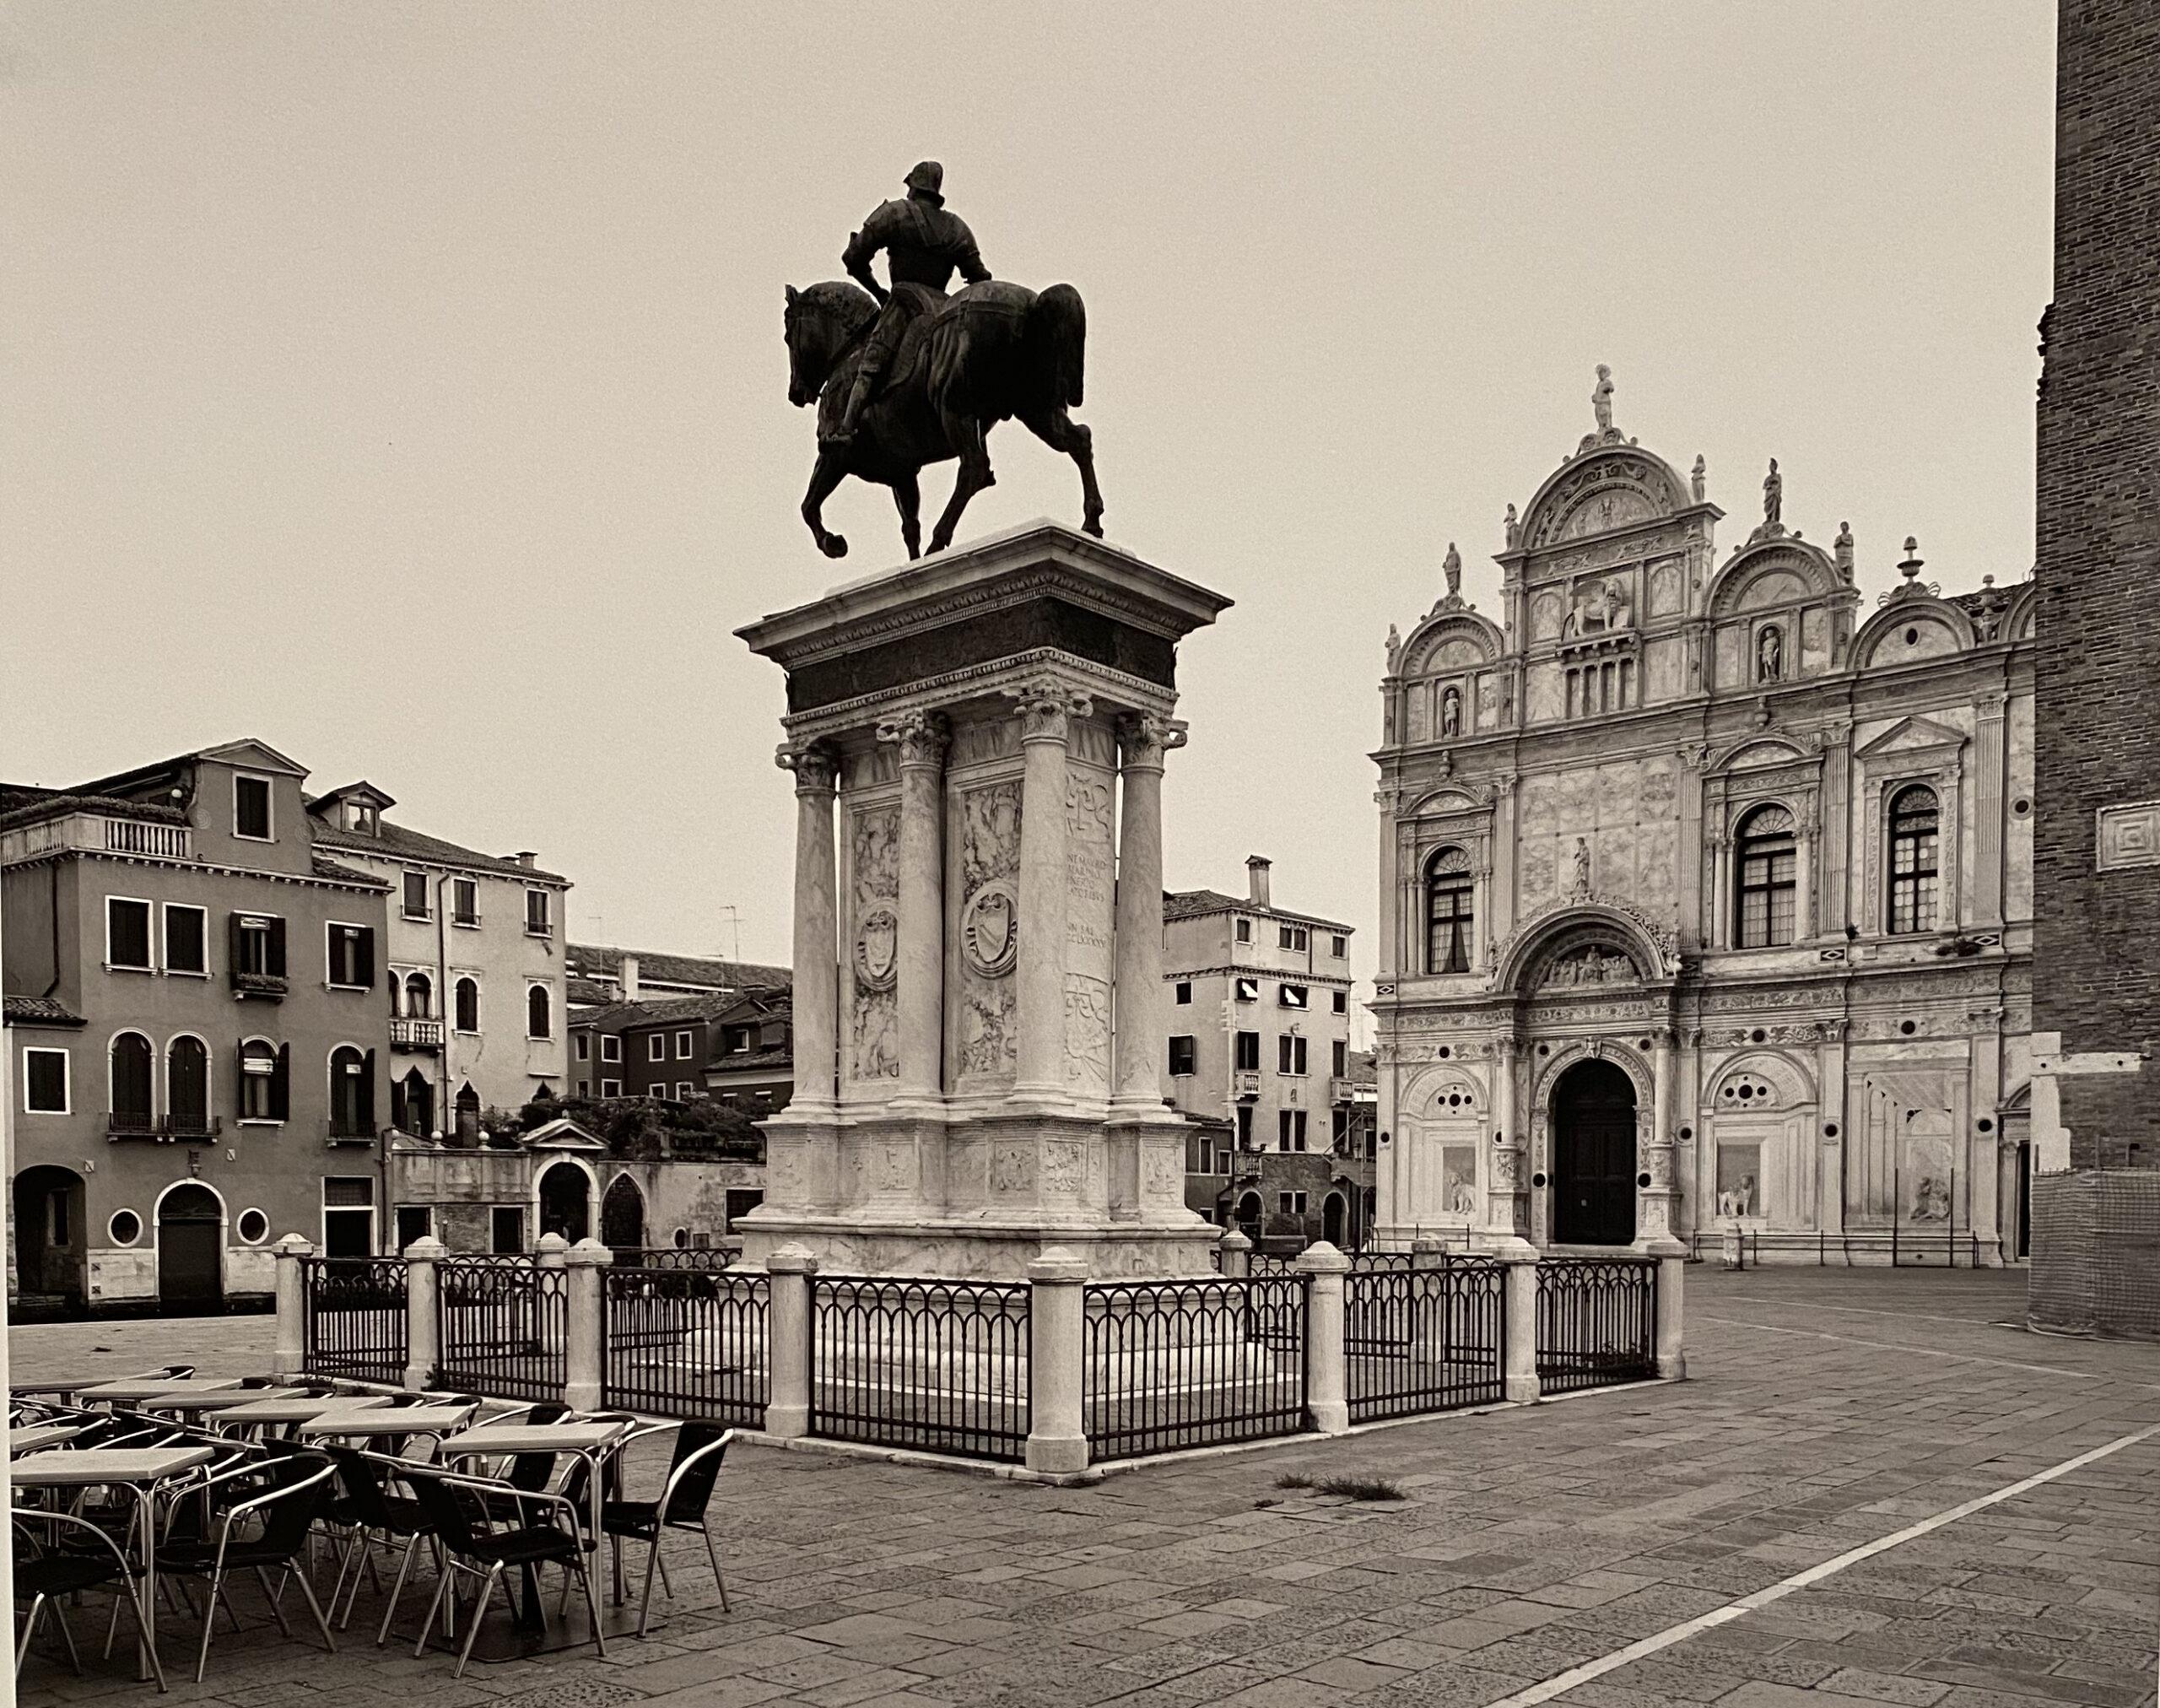 HYPERVENEZIA at Palazzo Grassi